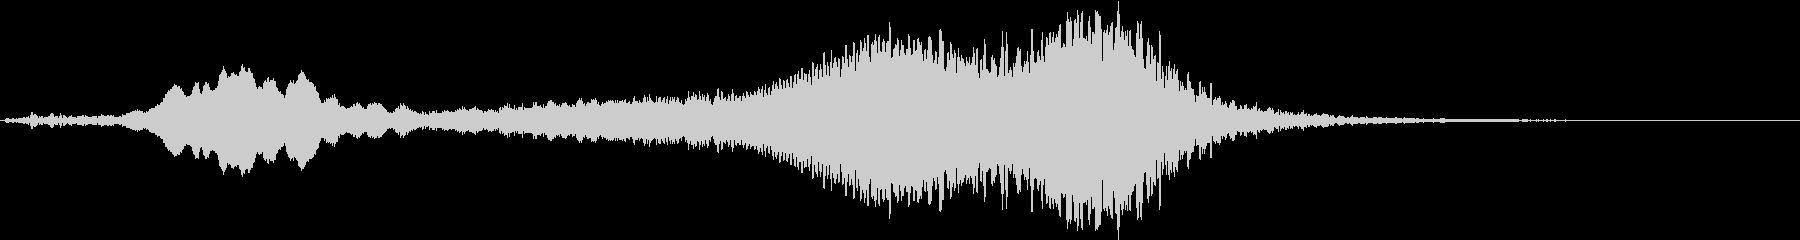 Texture 映画向け空間演出SE 5の未再生の波形